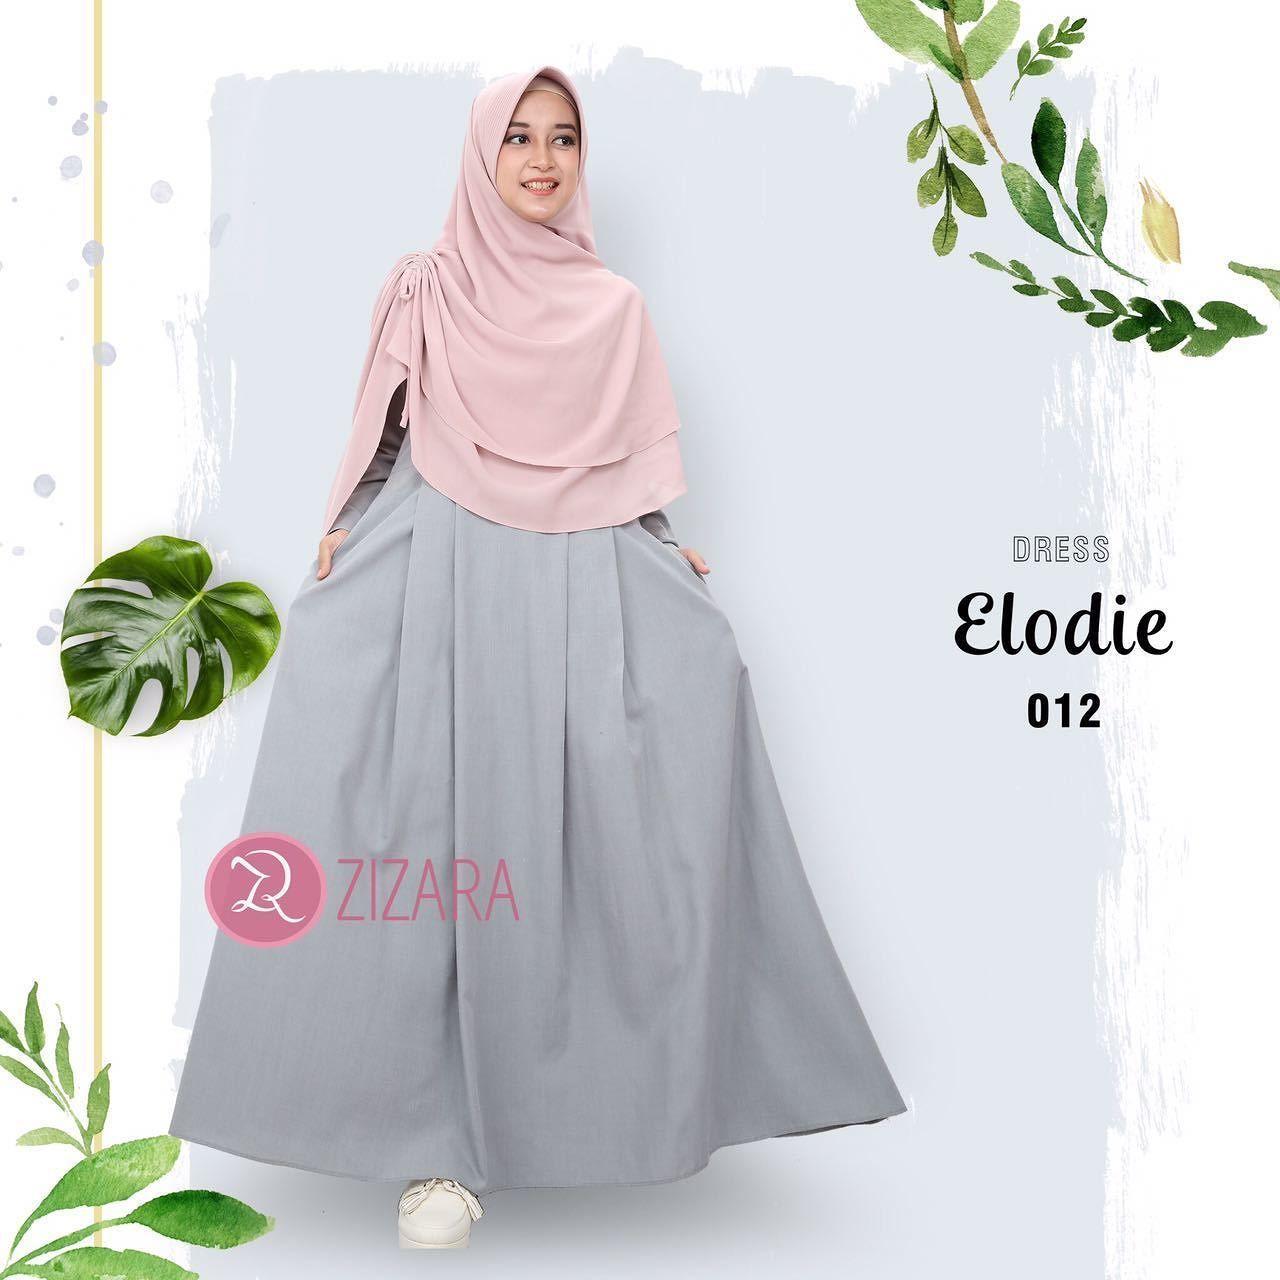 Gamis Zizara Elodie Dress 012 Baju Muslimah Busana Muslim Kini Rok Jeans 7 8 Drakblue Jsk5012 Allsize Hadir Untukmu Yang Cantik Syari